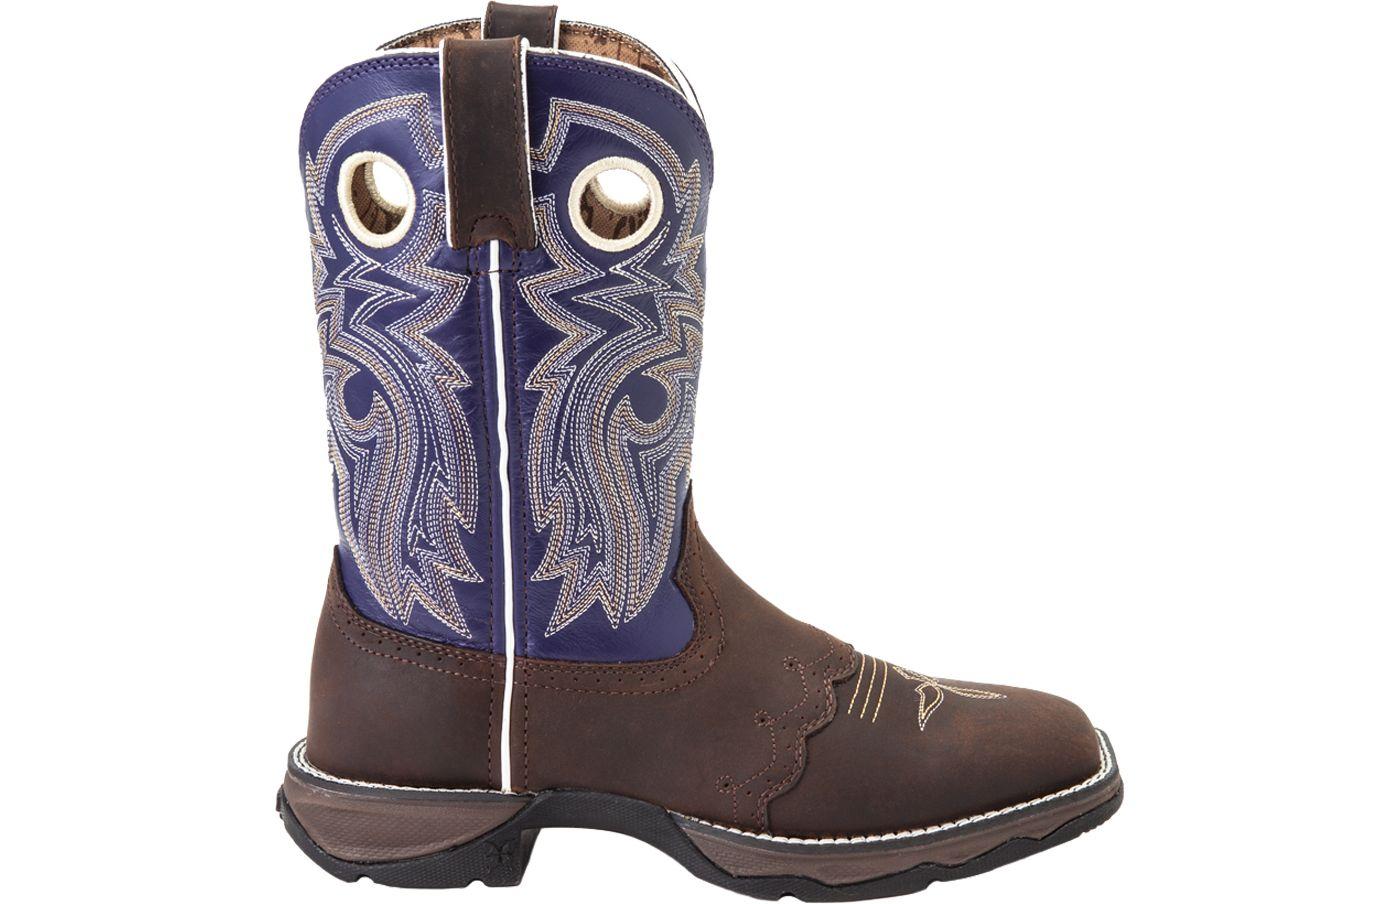 Durango Women's Lady Rebel Saddle-Lace Western Work Boots